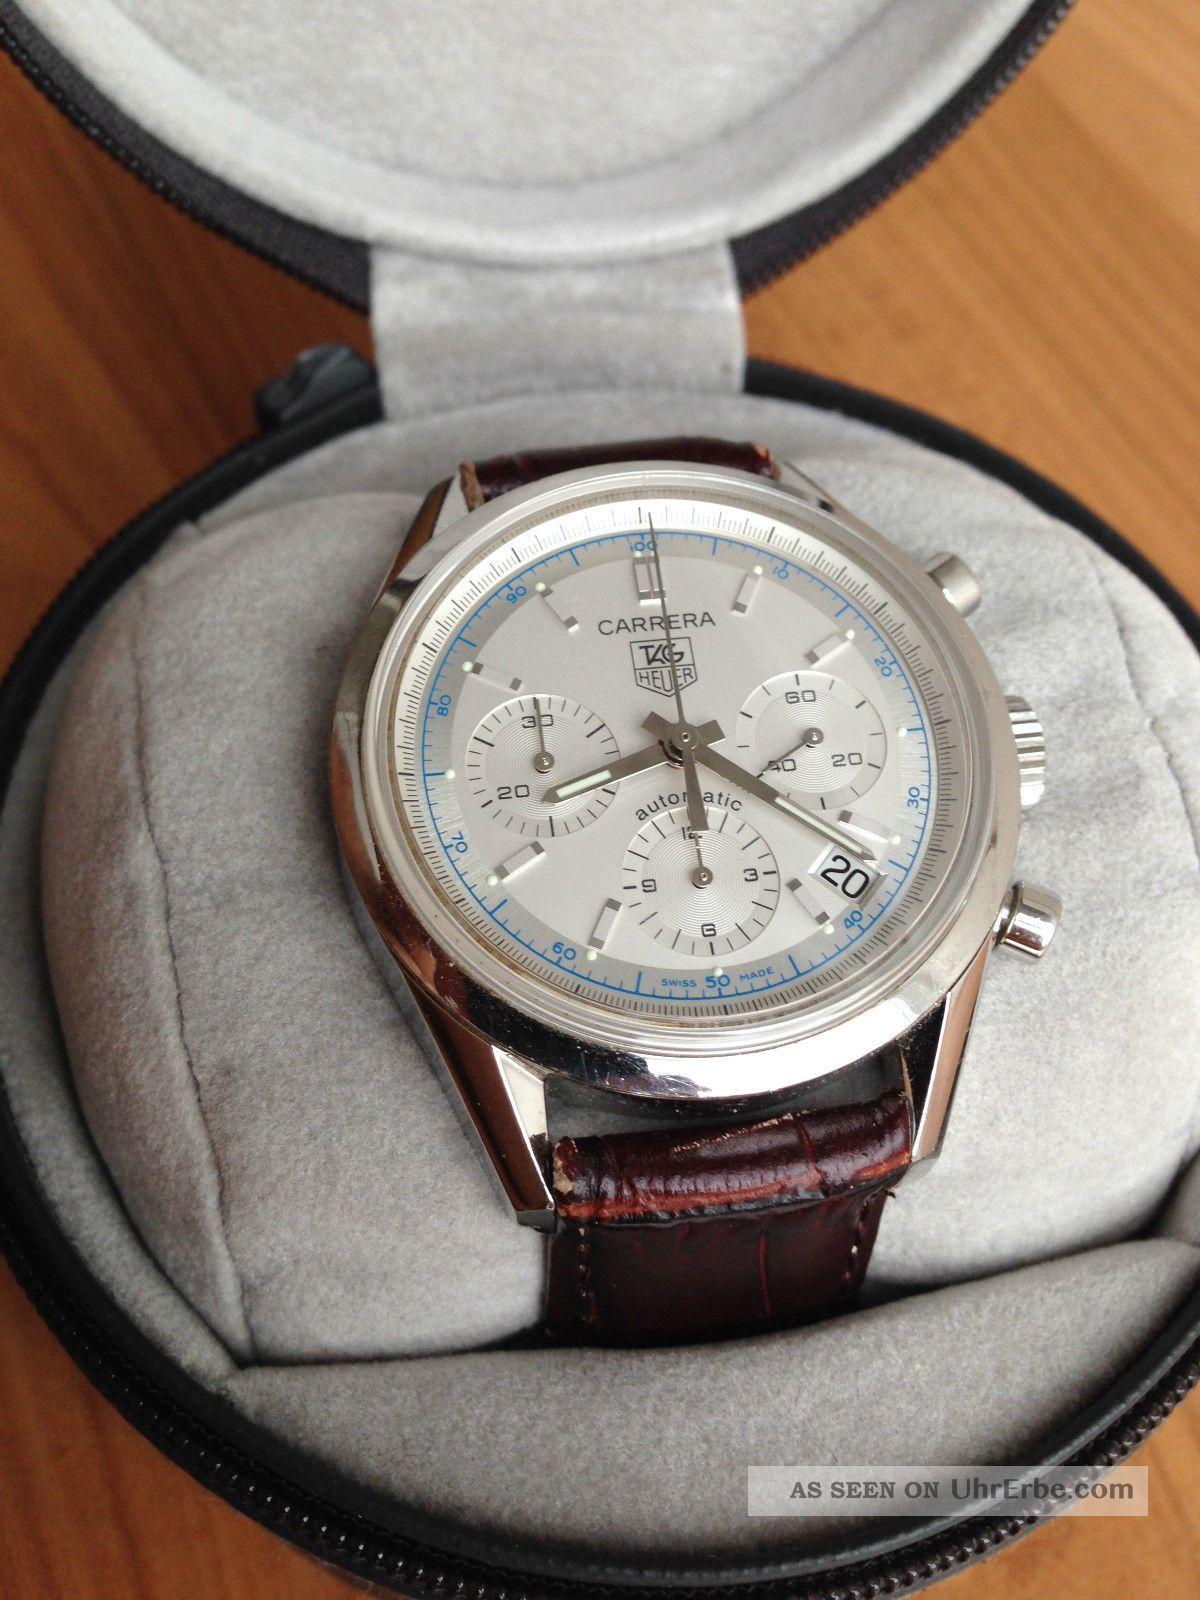 Tag Heuer Carrera Cv2110 - 0 Chronograph Mit Zertifikat Box Garantiekarte Armbanduhren Bild